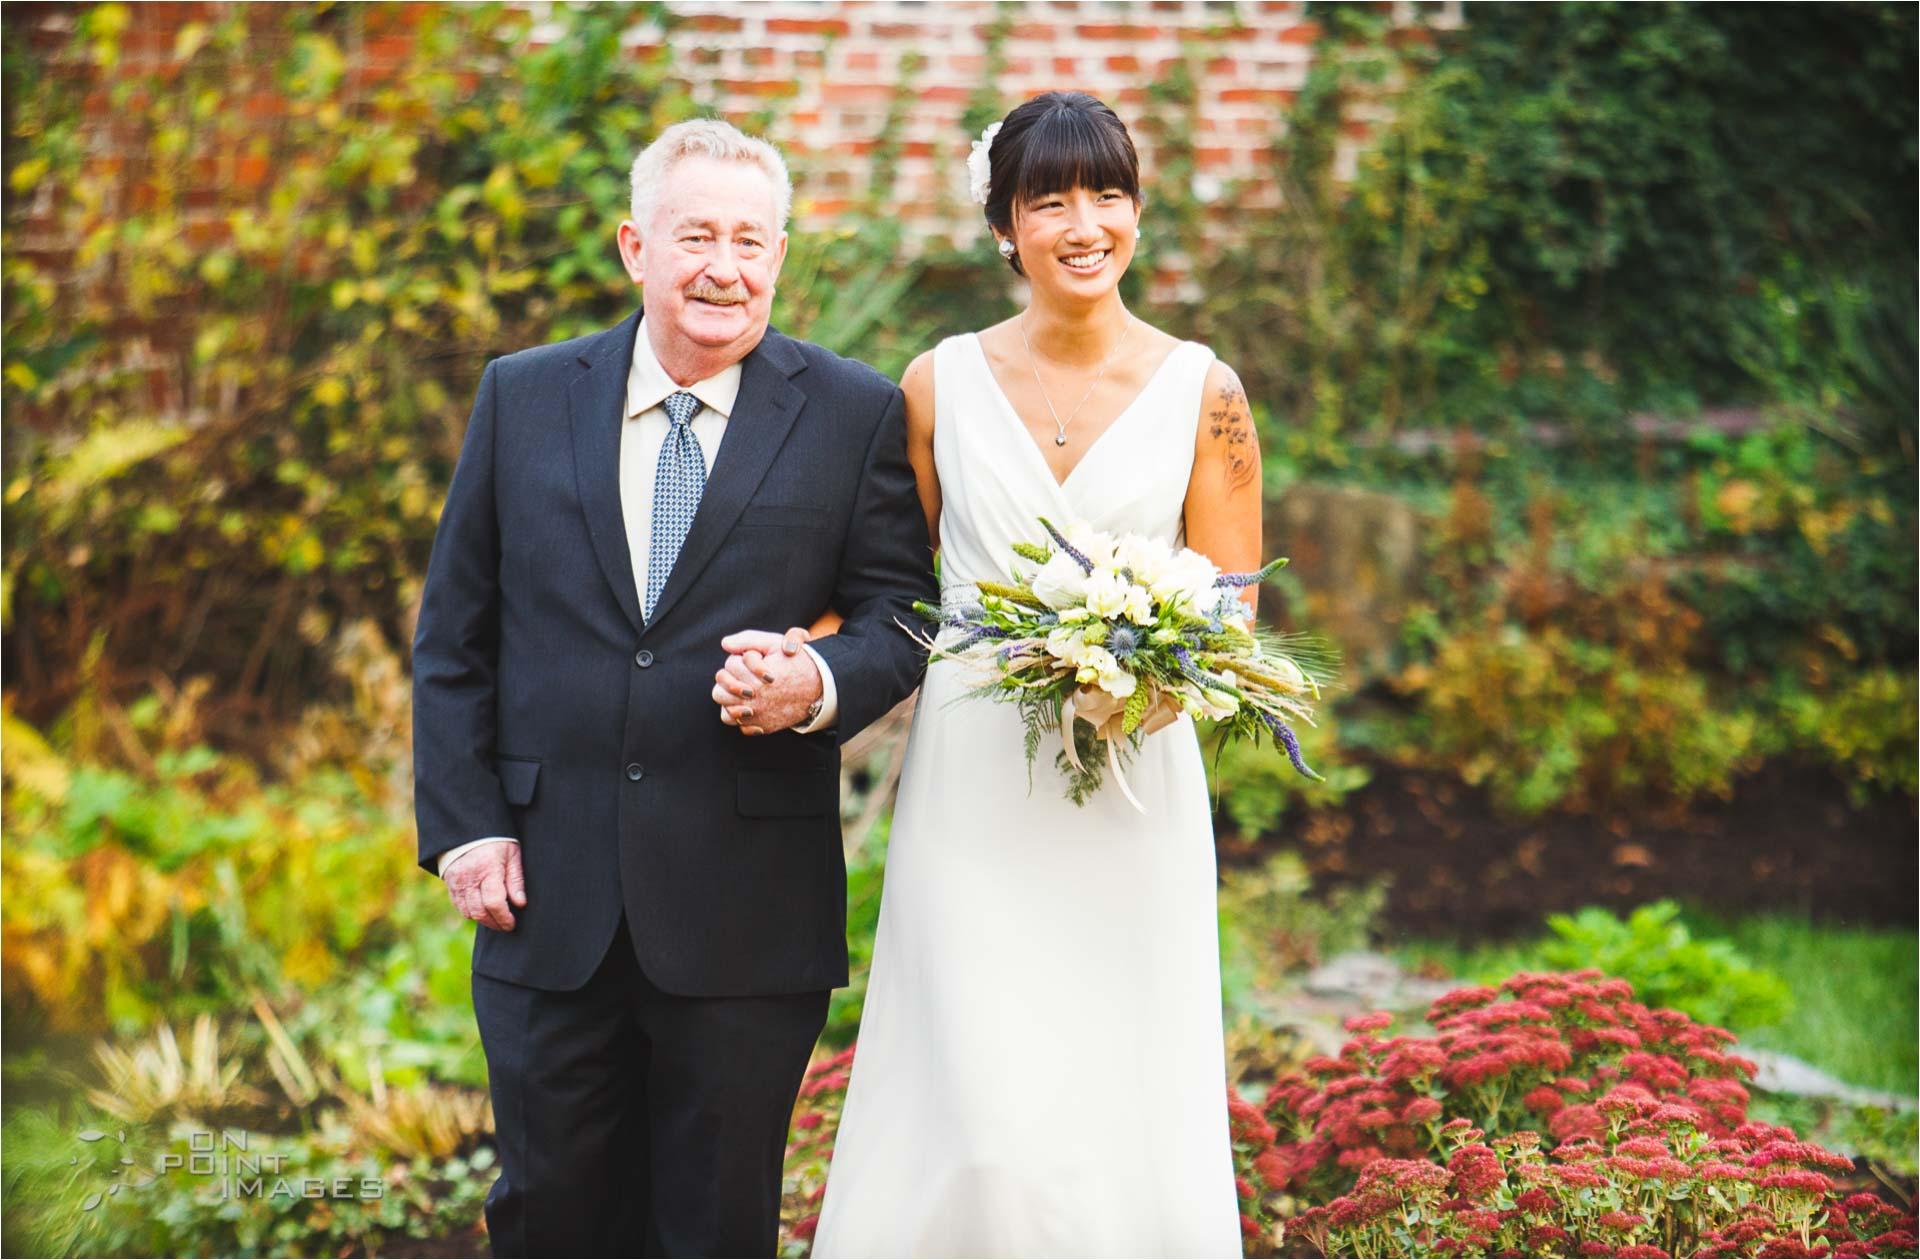 Wedding Ceremony at Webb Barn in Wethersfield